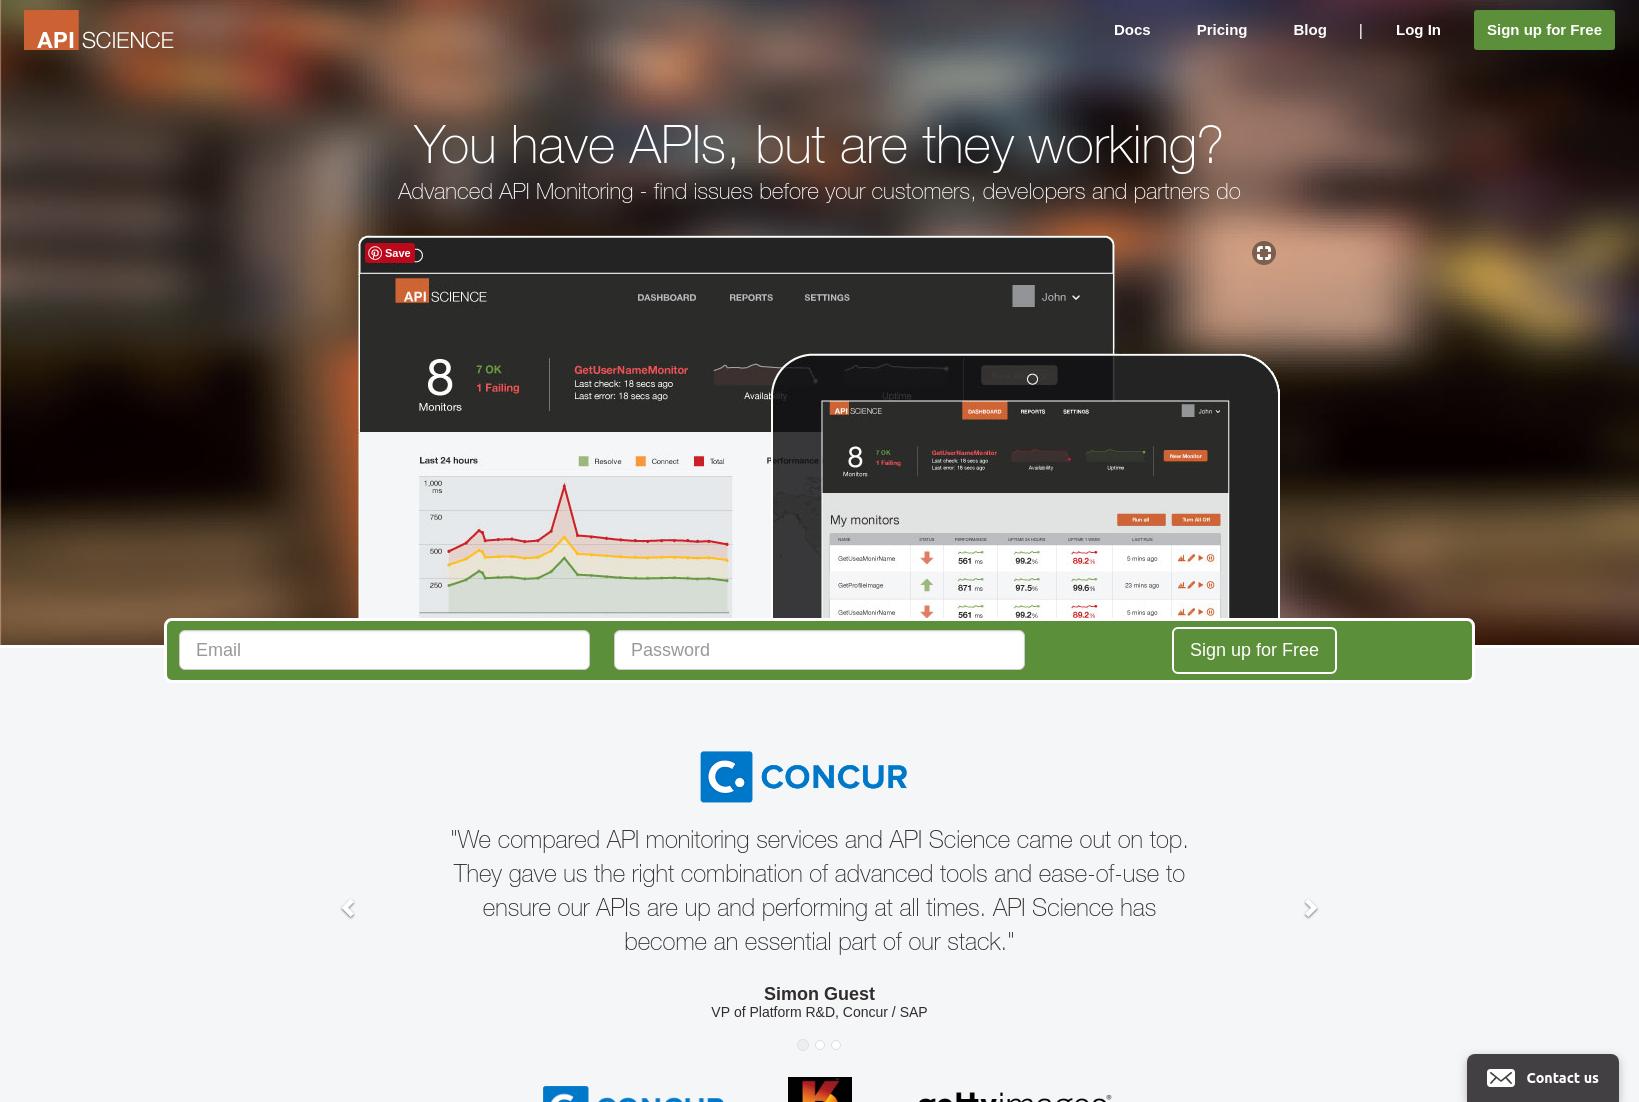 APIScience